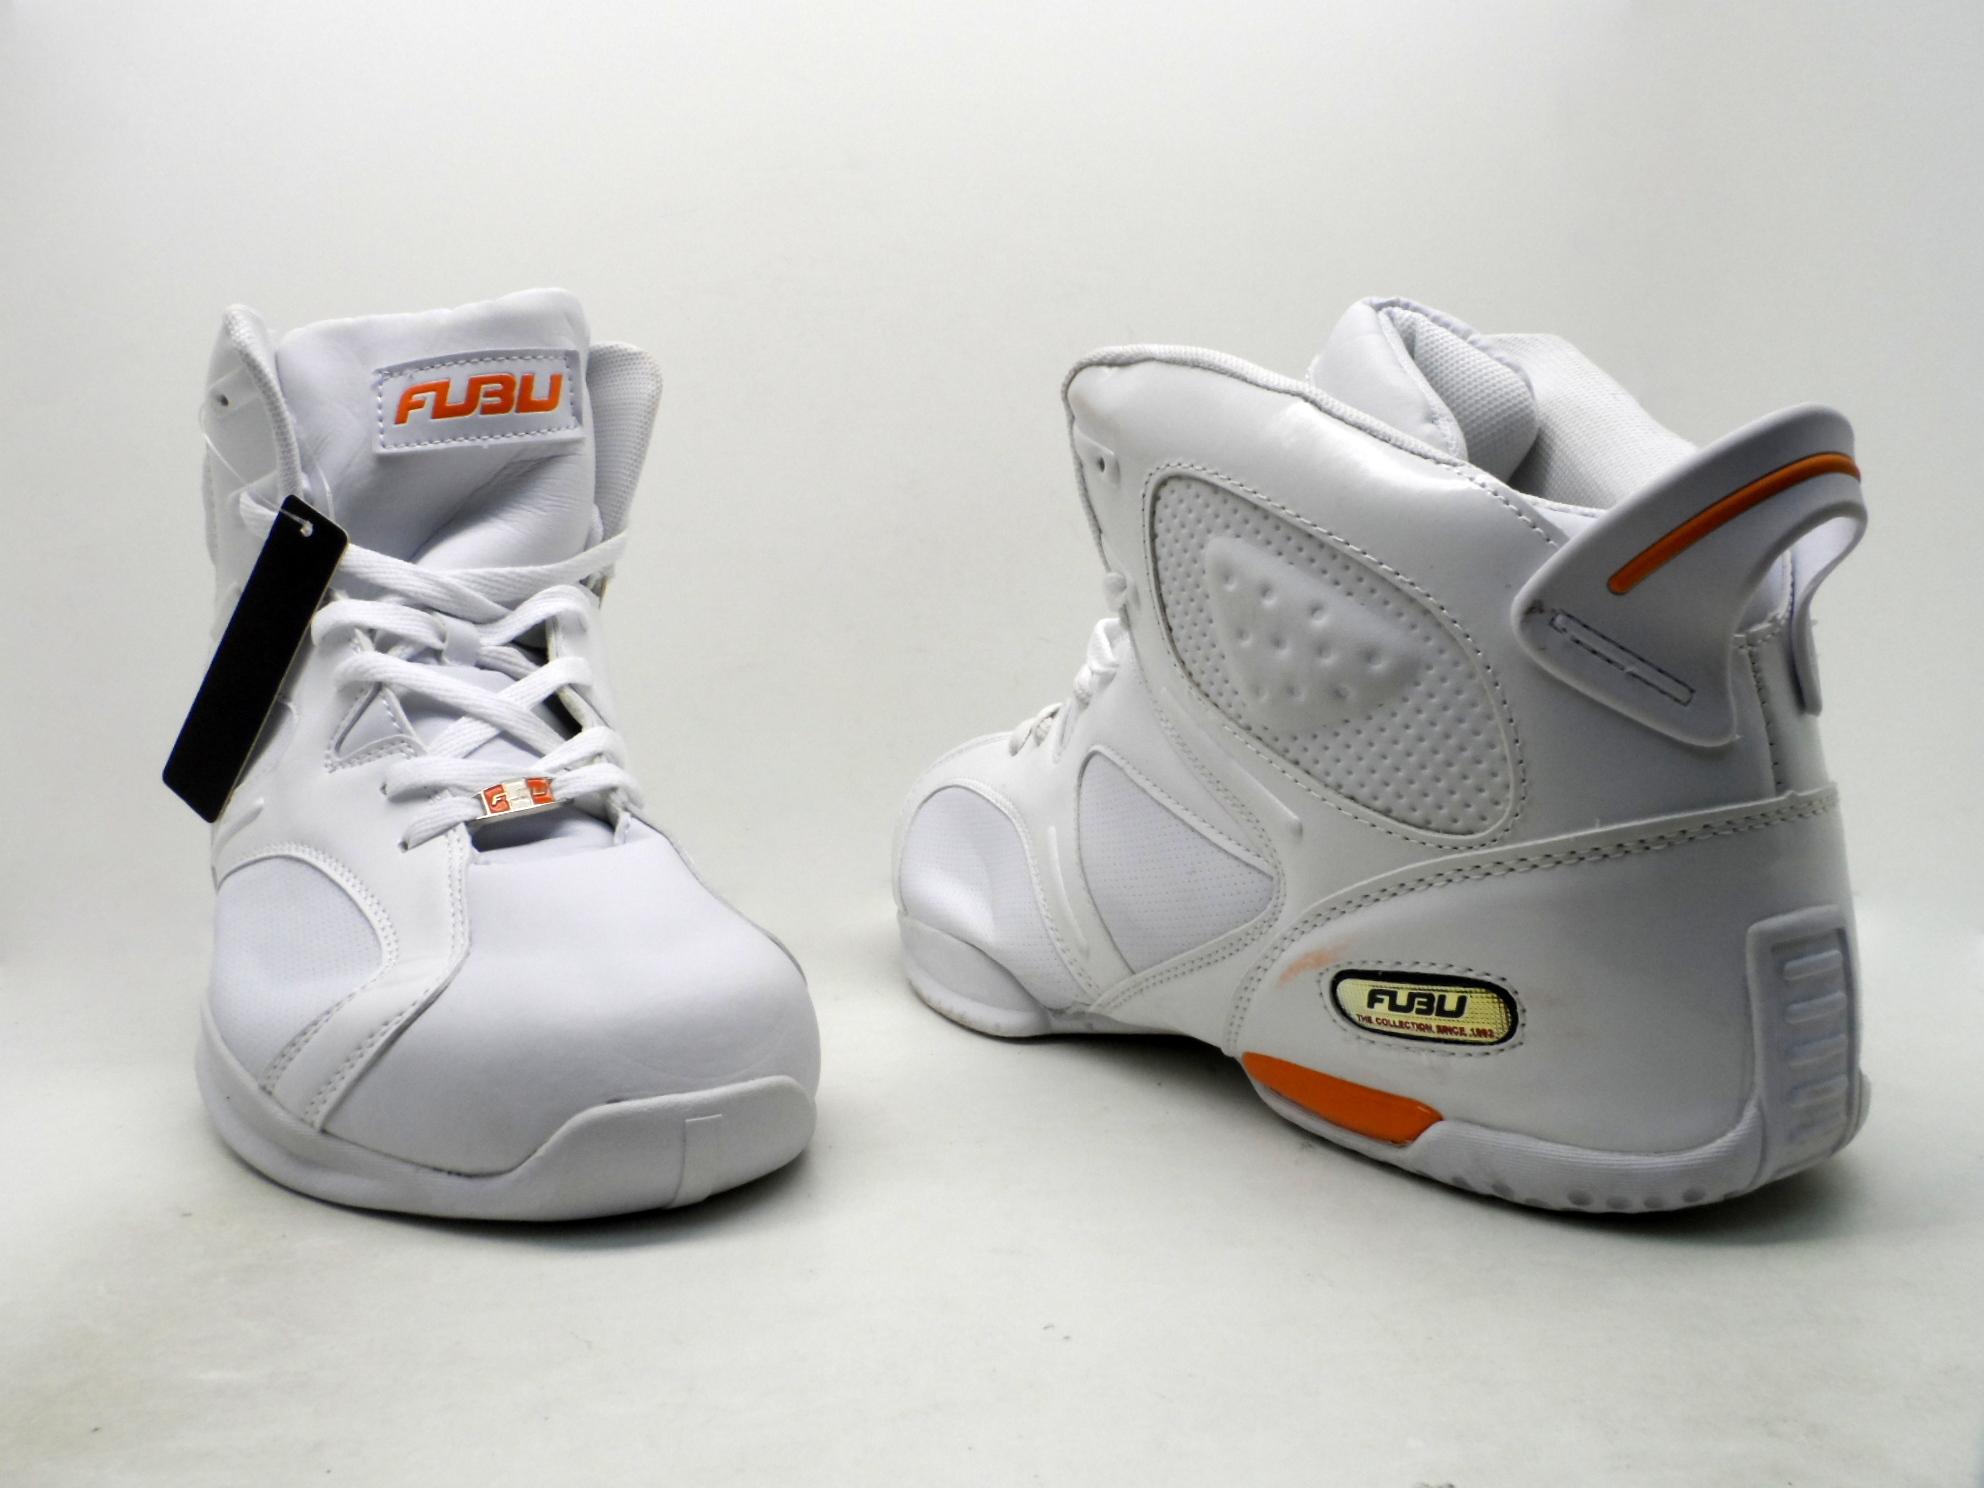 Fubu Running Shoes